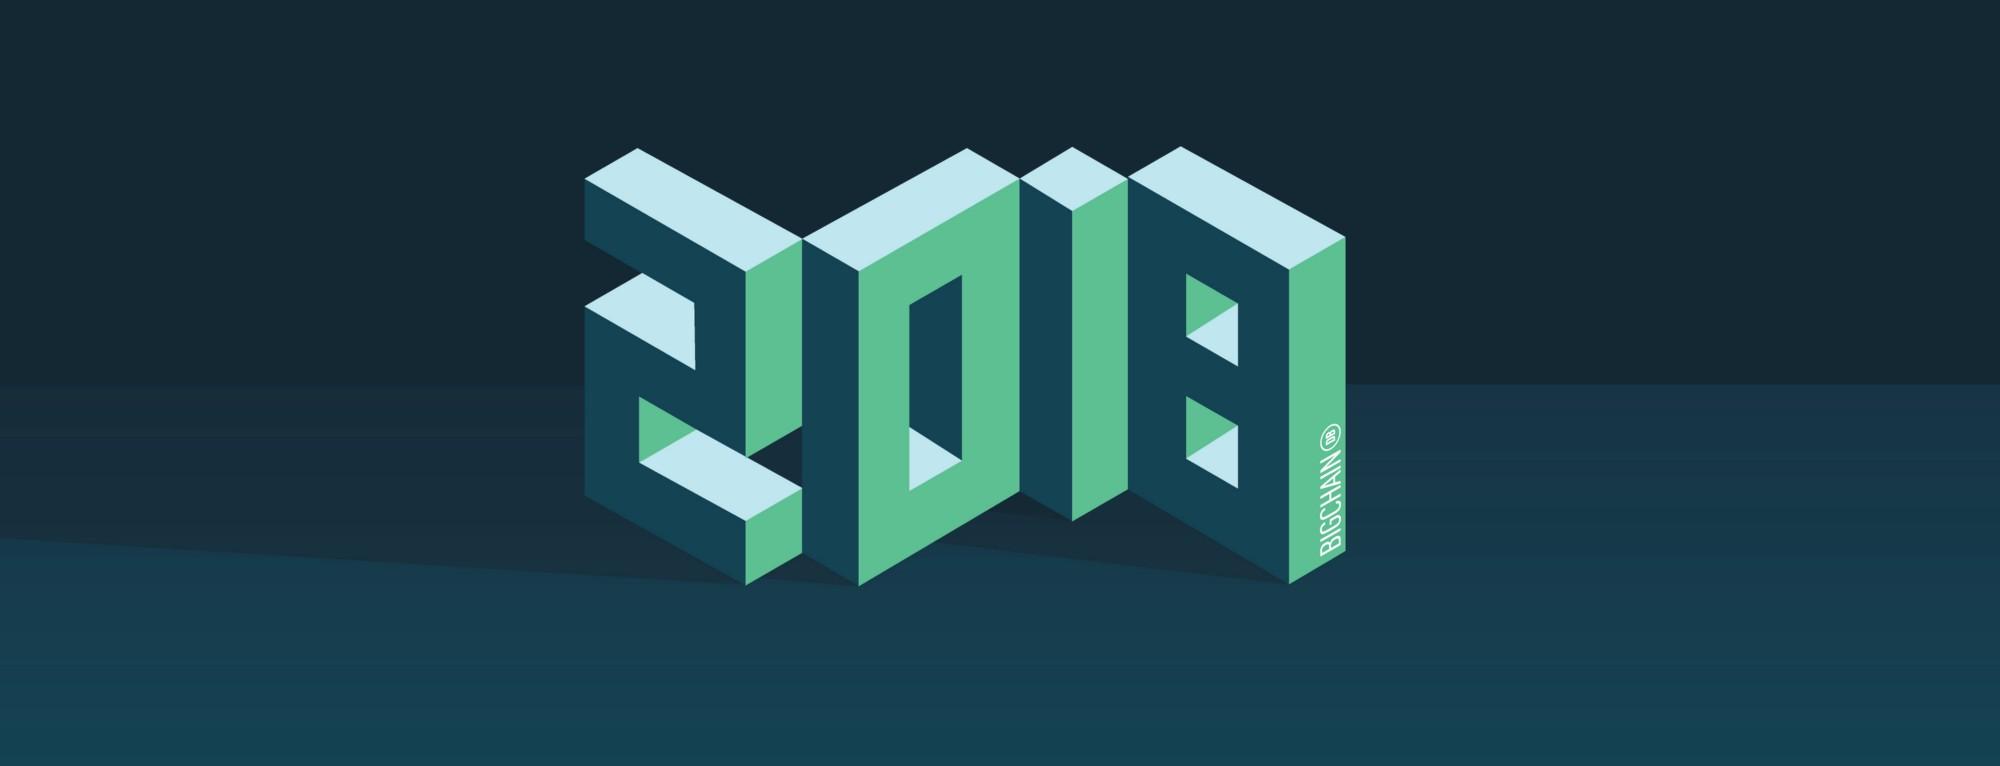 2018. The Year for Data Driven Blockchains | The BigchainDB Blog